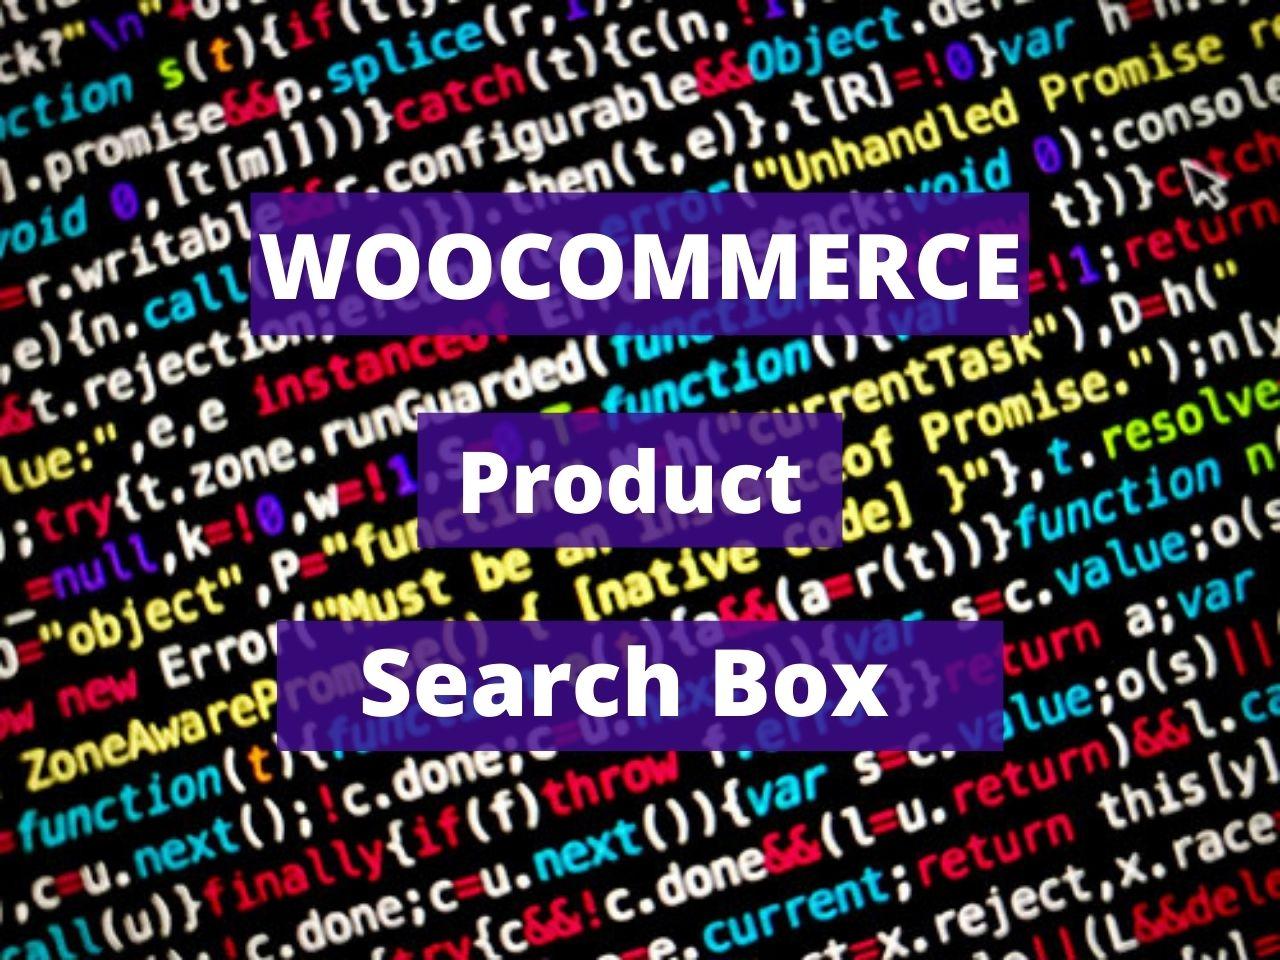 Woocommerce Product Search Box Widget